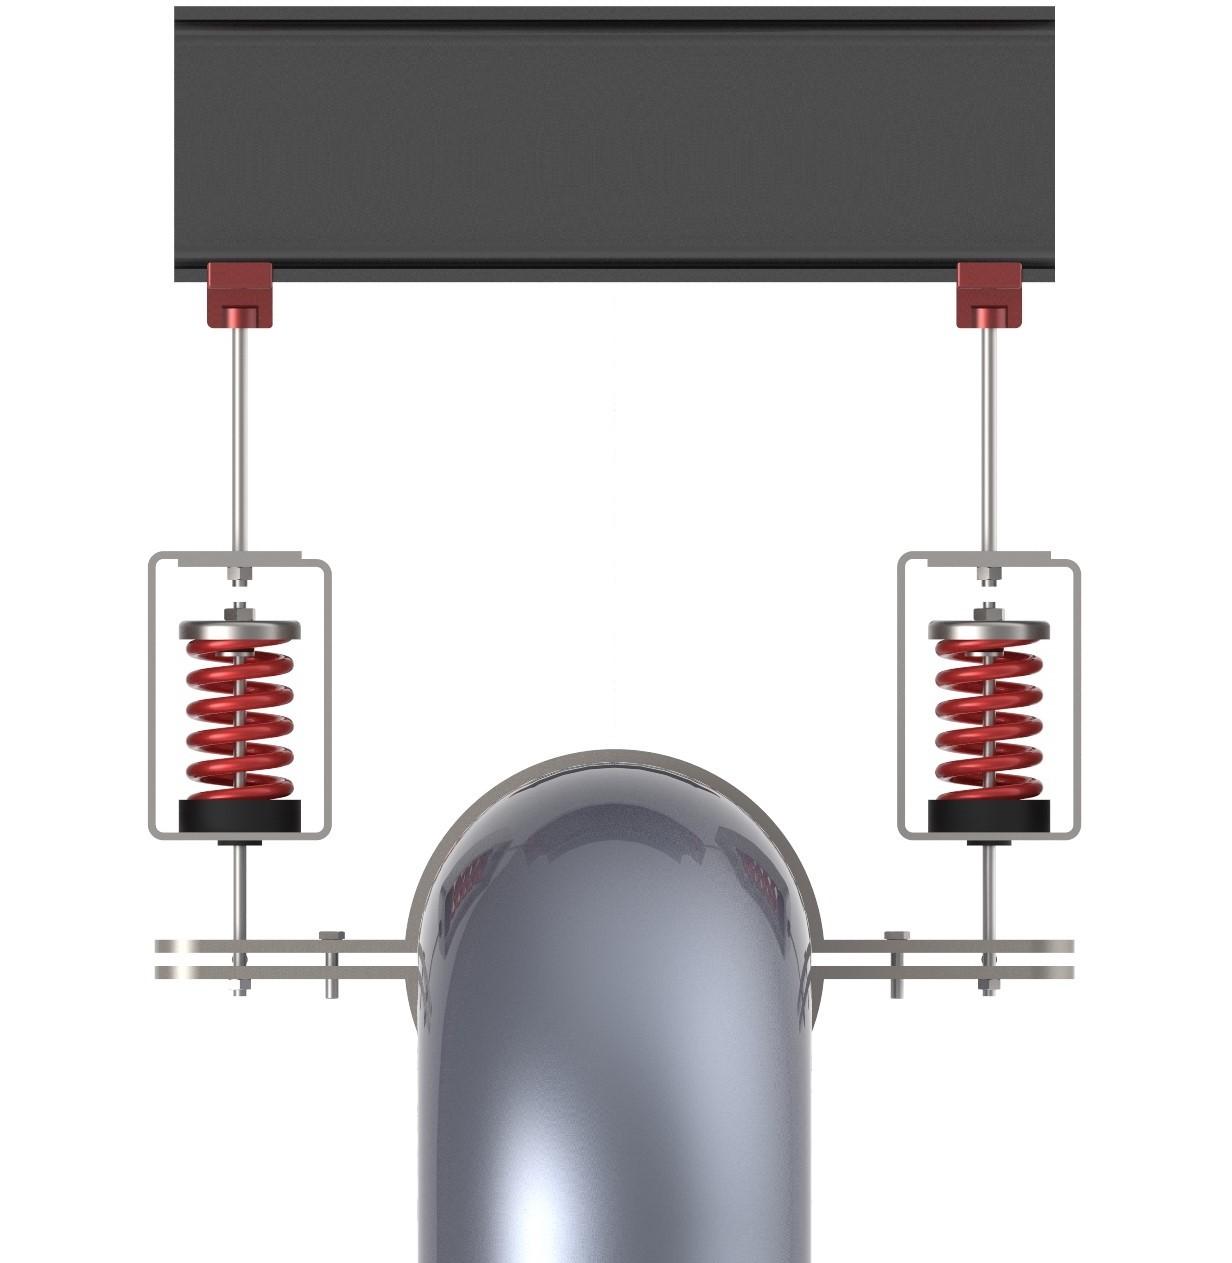 pipe-riser-insulation-04.jpg